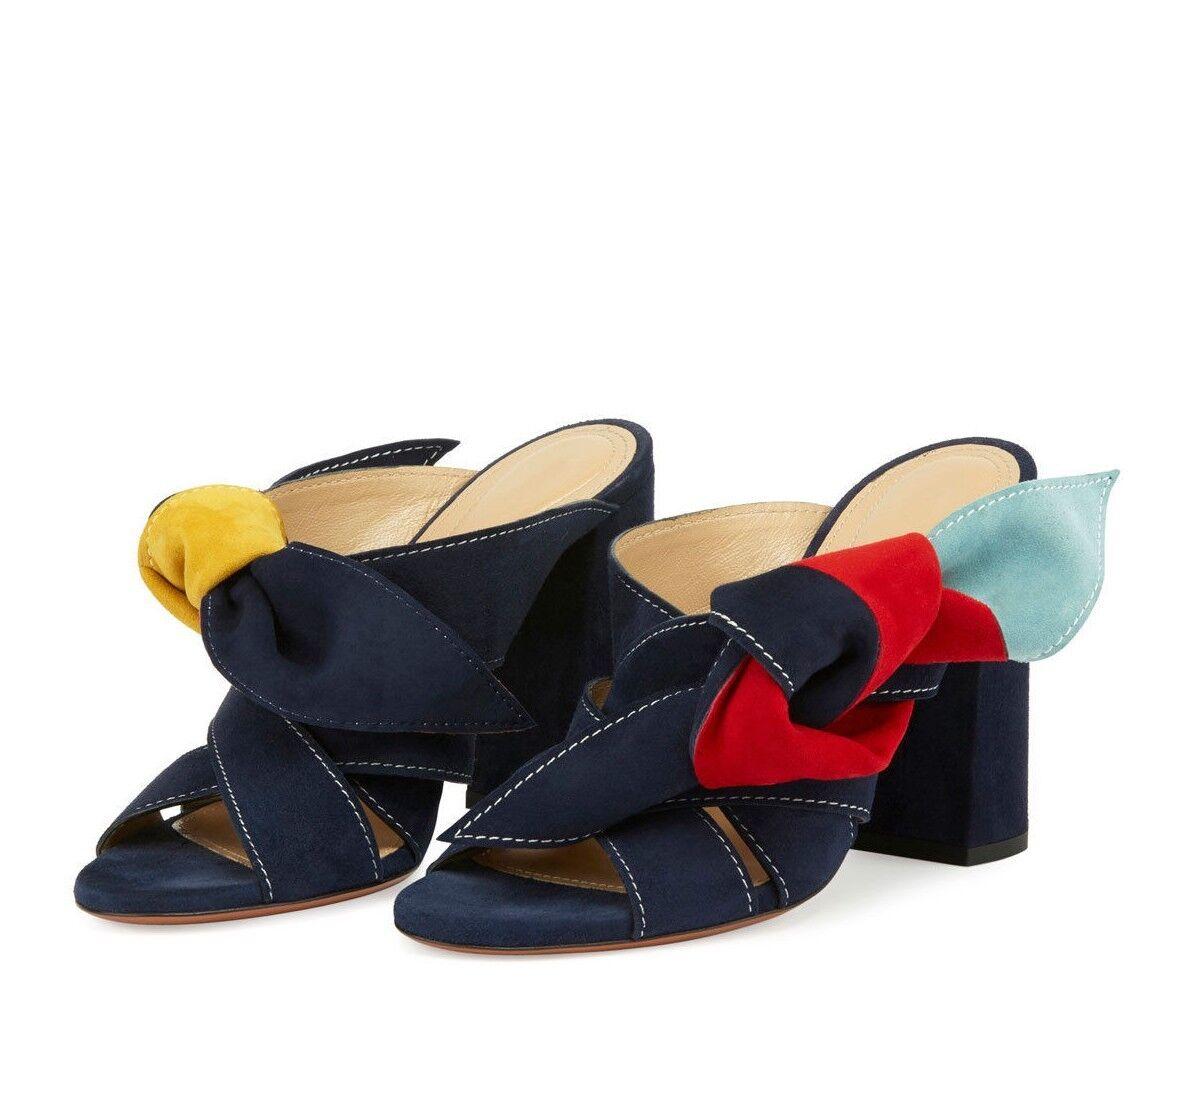 830 CHLOE Nellie Navy bleu rouge jaune Knot Suede Mules Sandals 41